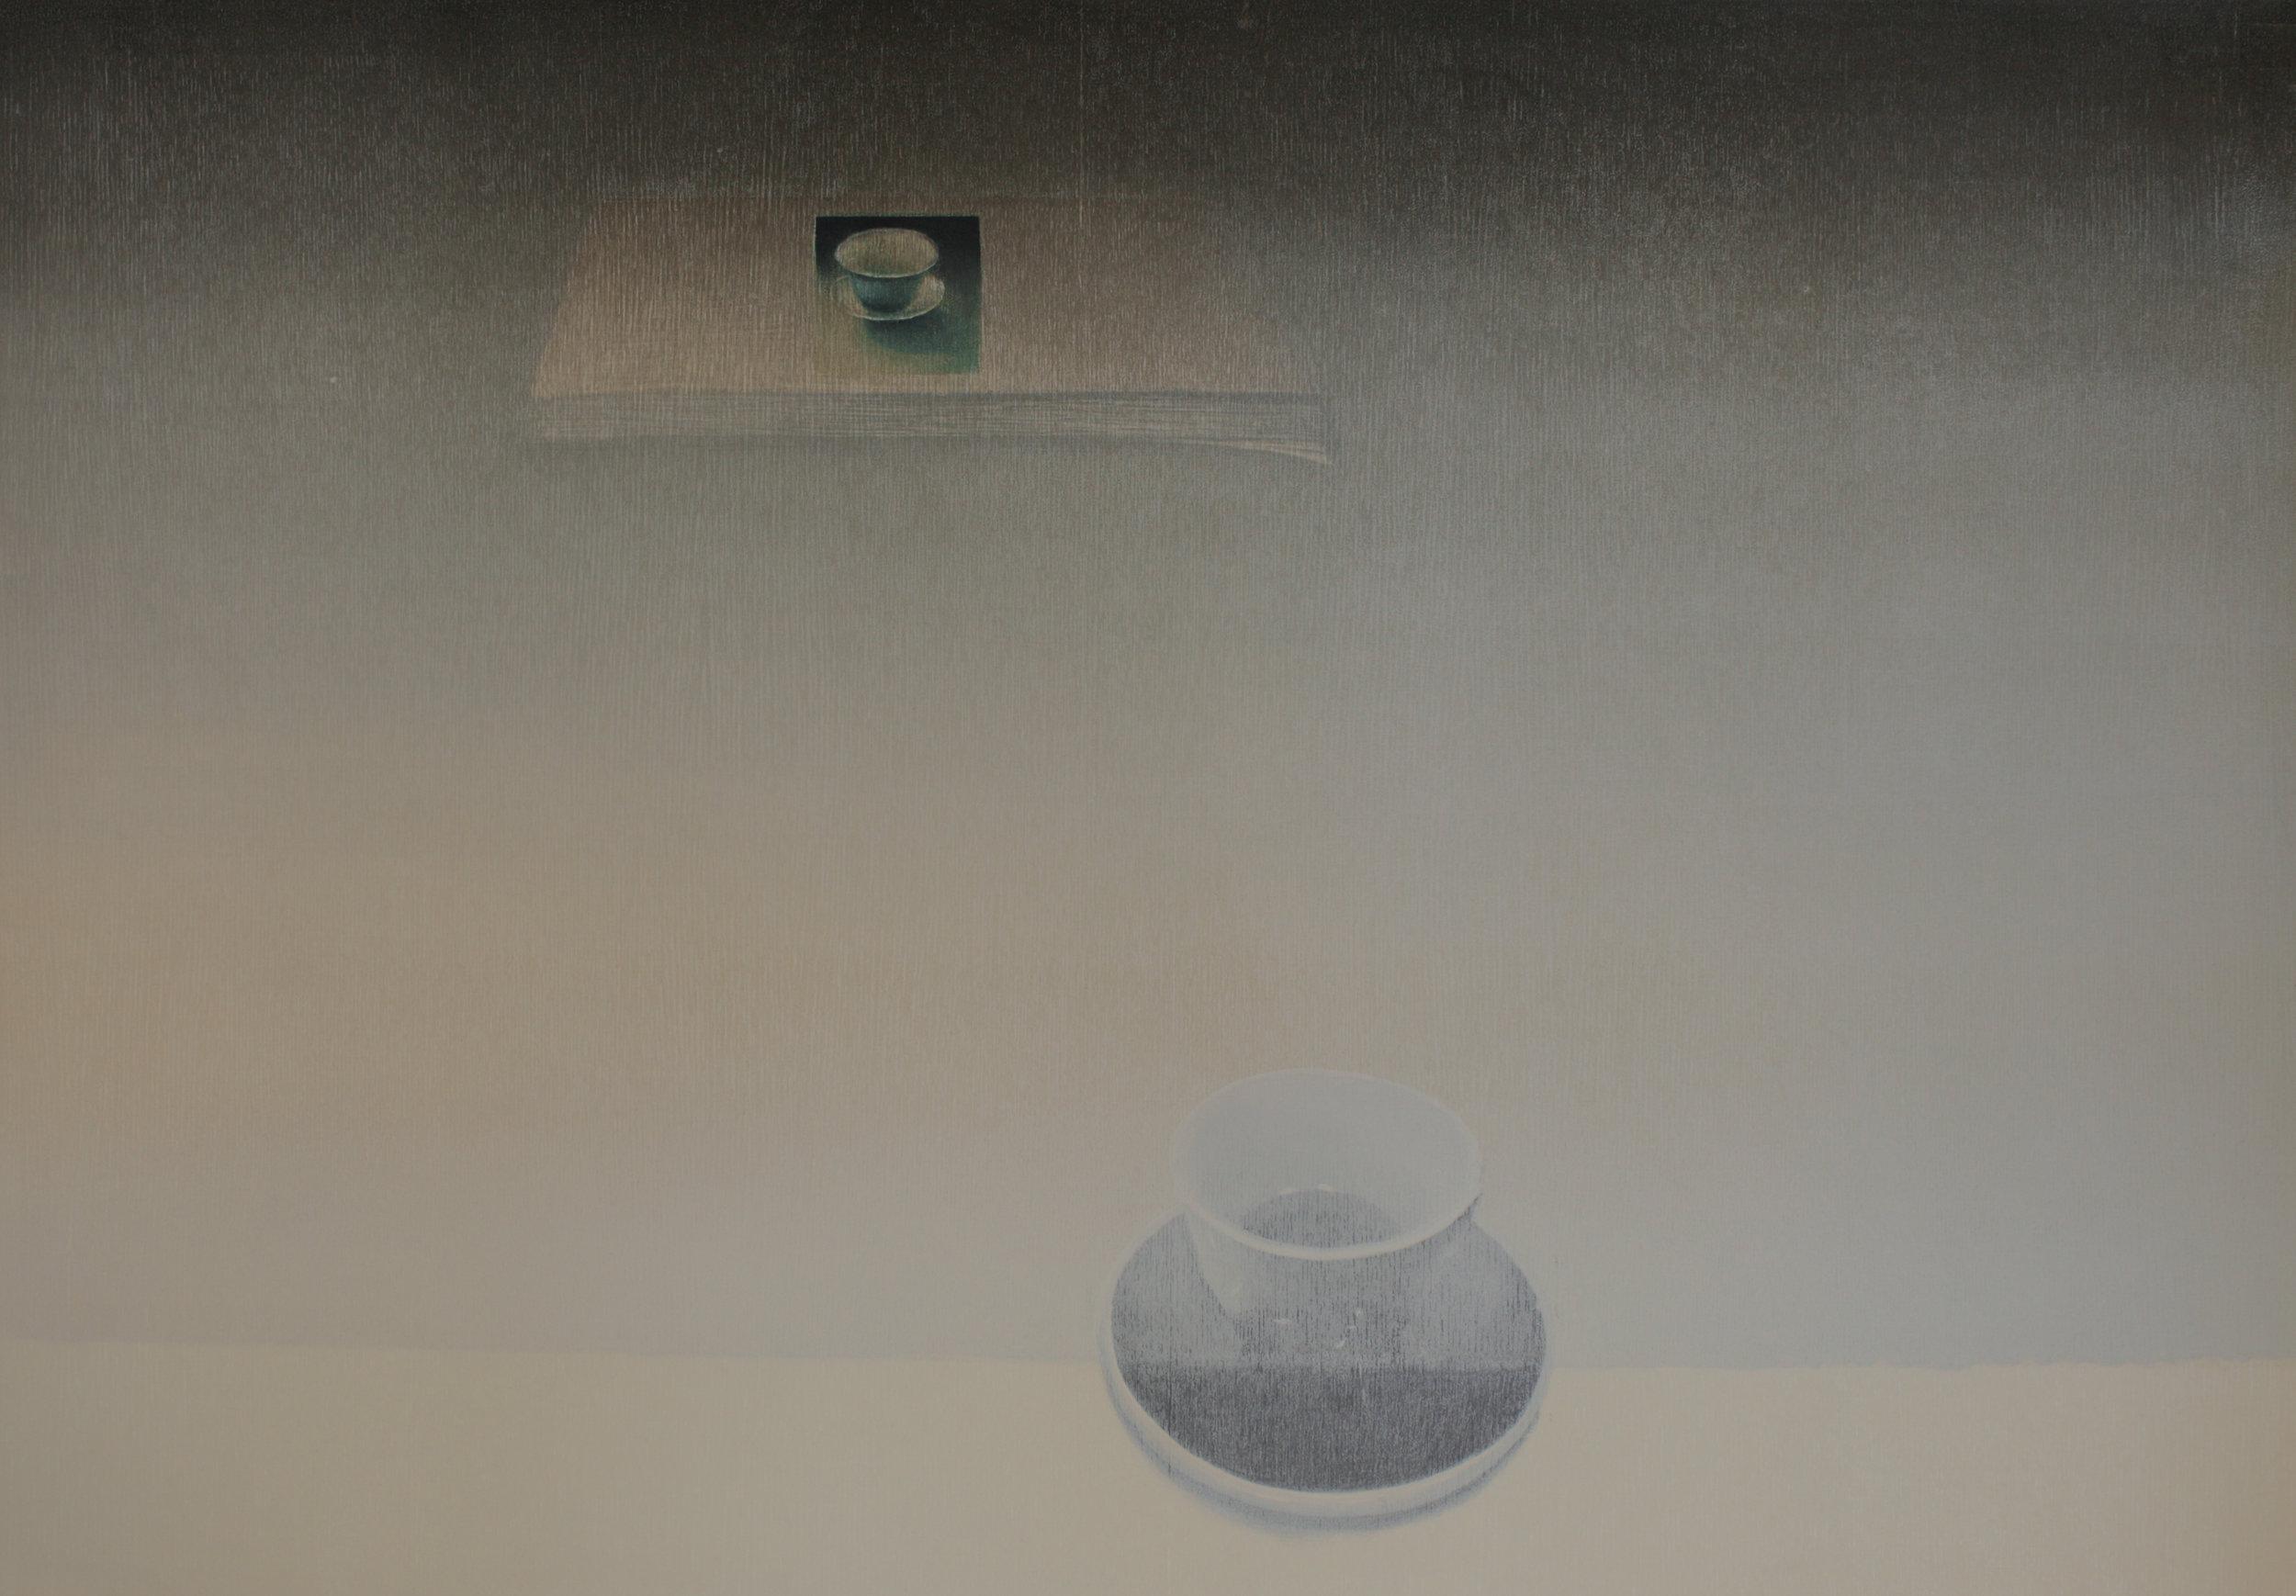 Praween PIANGCHOOMPU, Equilibrium #7, 2019, Woodcut on Paper, 1 of 5, 60 x 85 cm